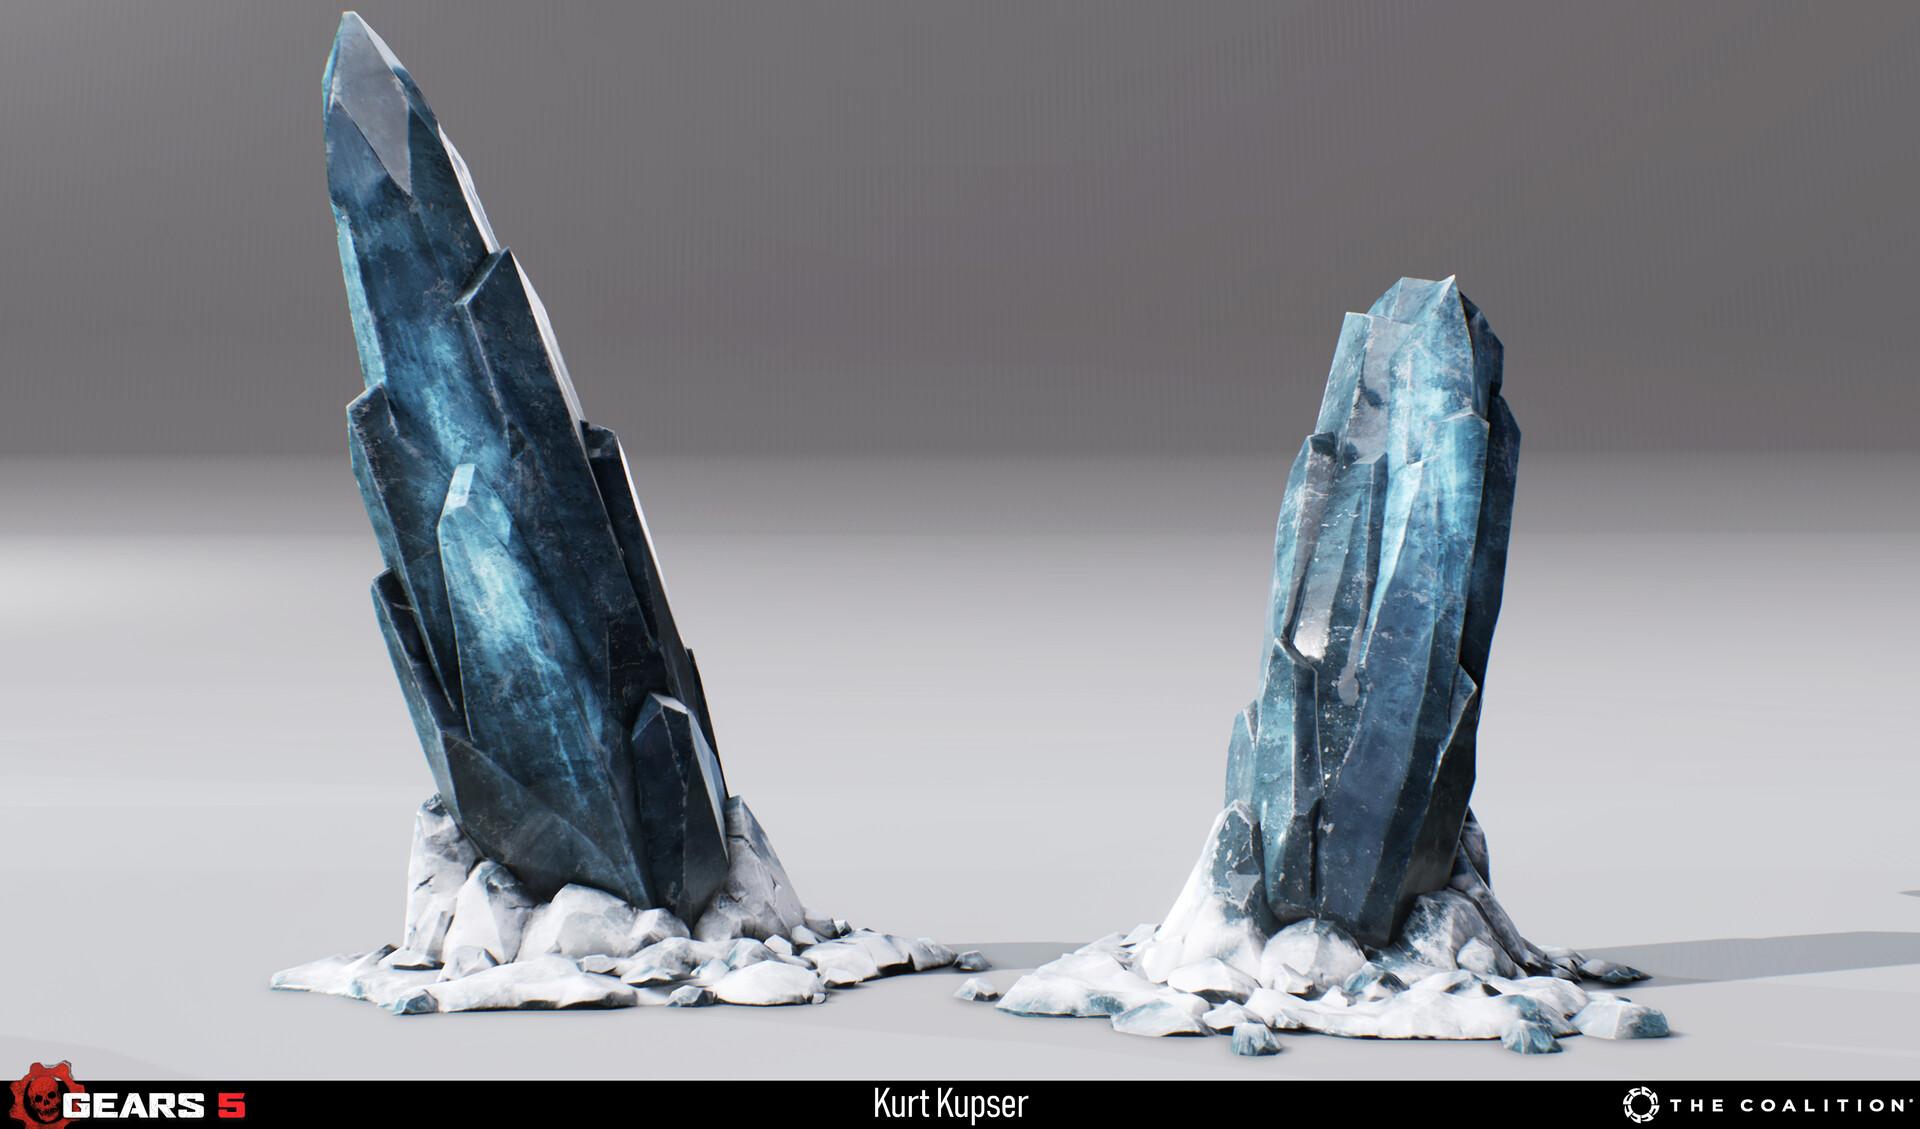 Ice cover asset made by Stef Velzeboer https://www.artstation.com/stefvelzeboer